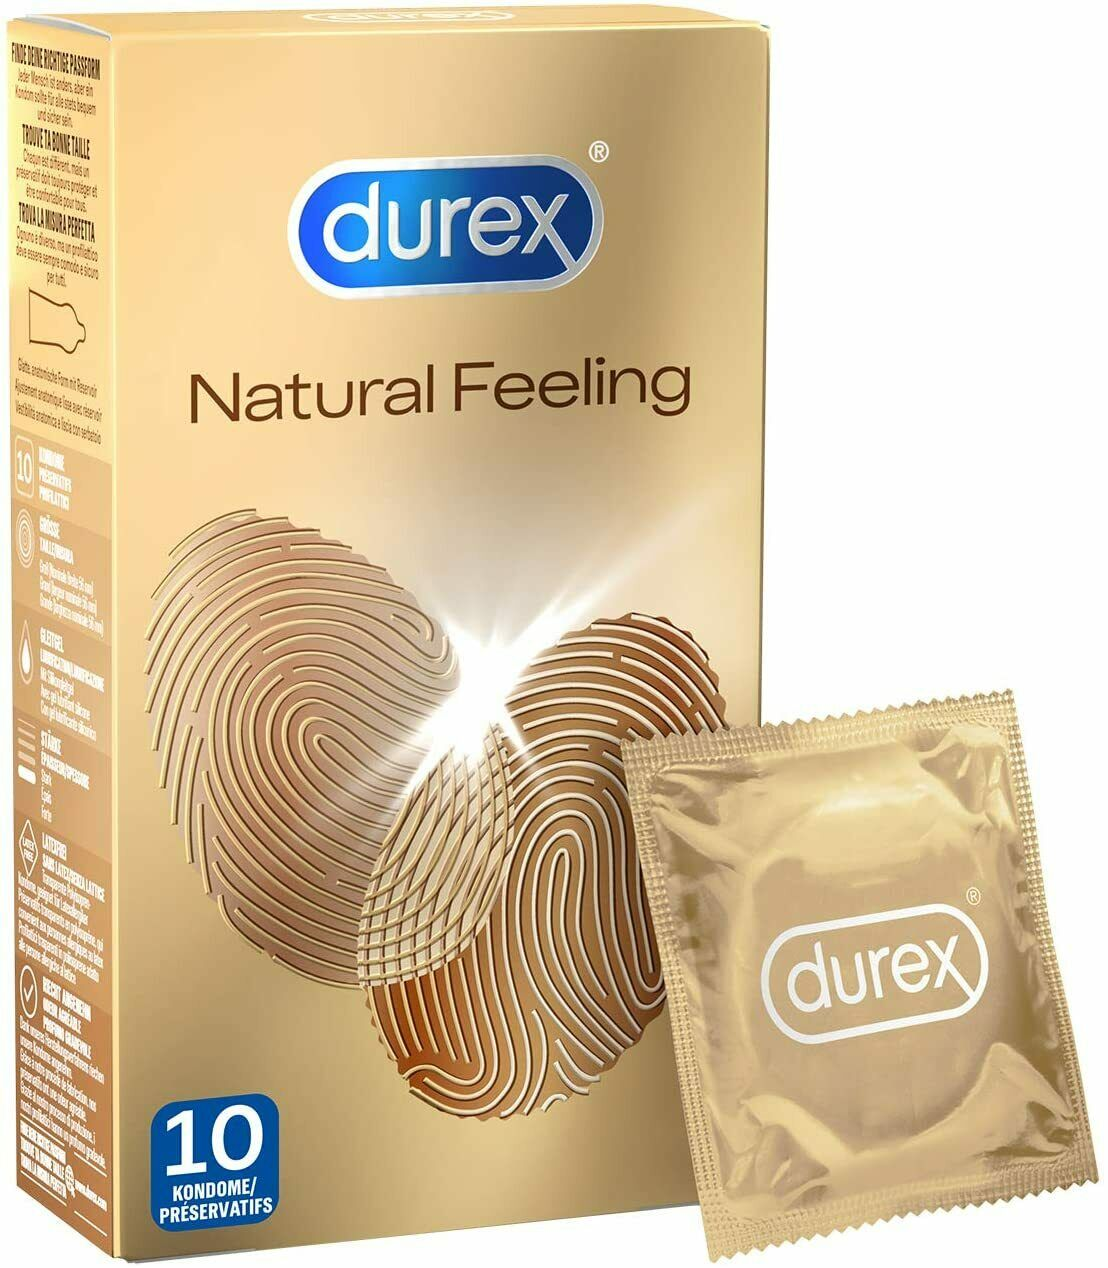 Durex Natural Feeling Kondome Latexfreie Kondome 1 x 10 Stück